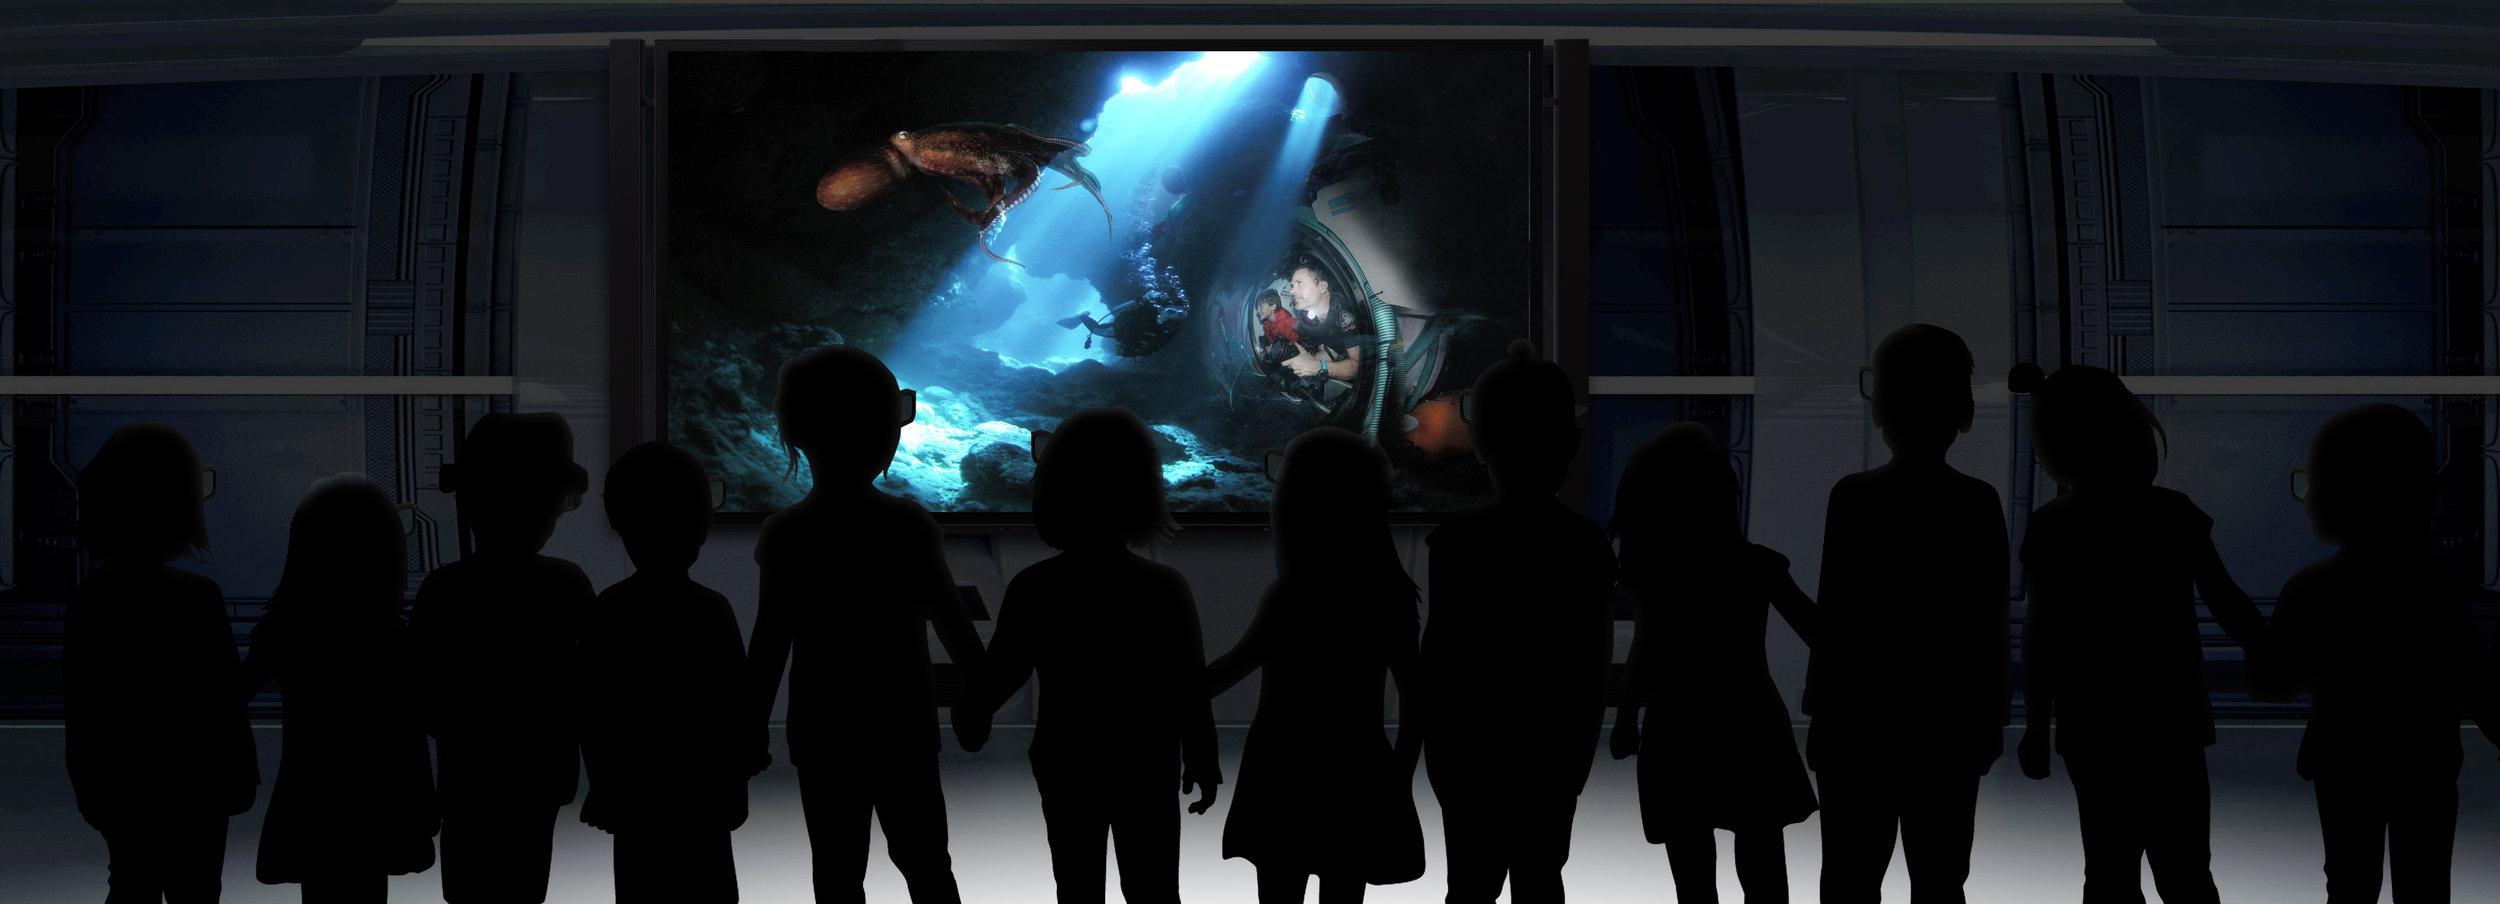 kids watching movie inside pod 03.jpg